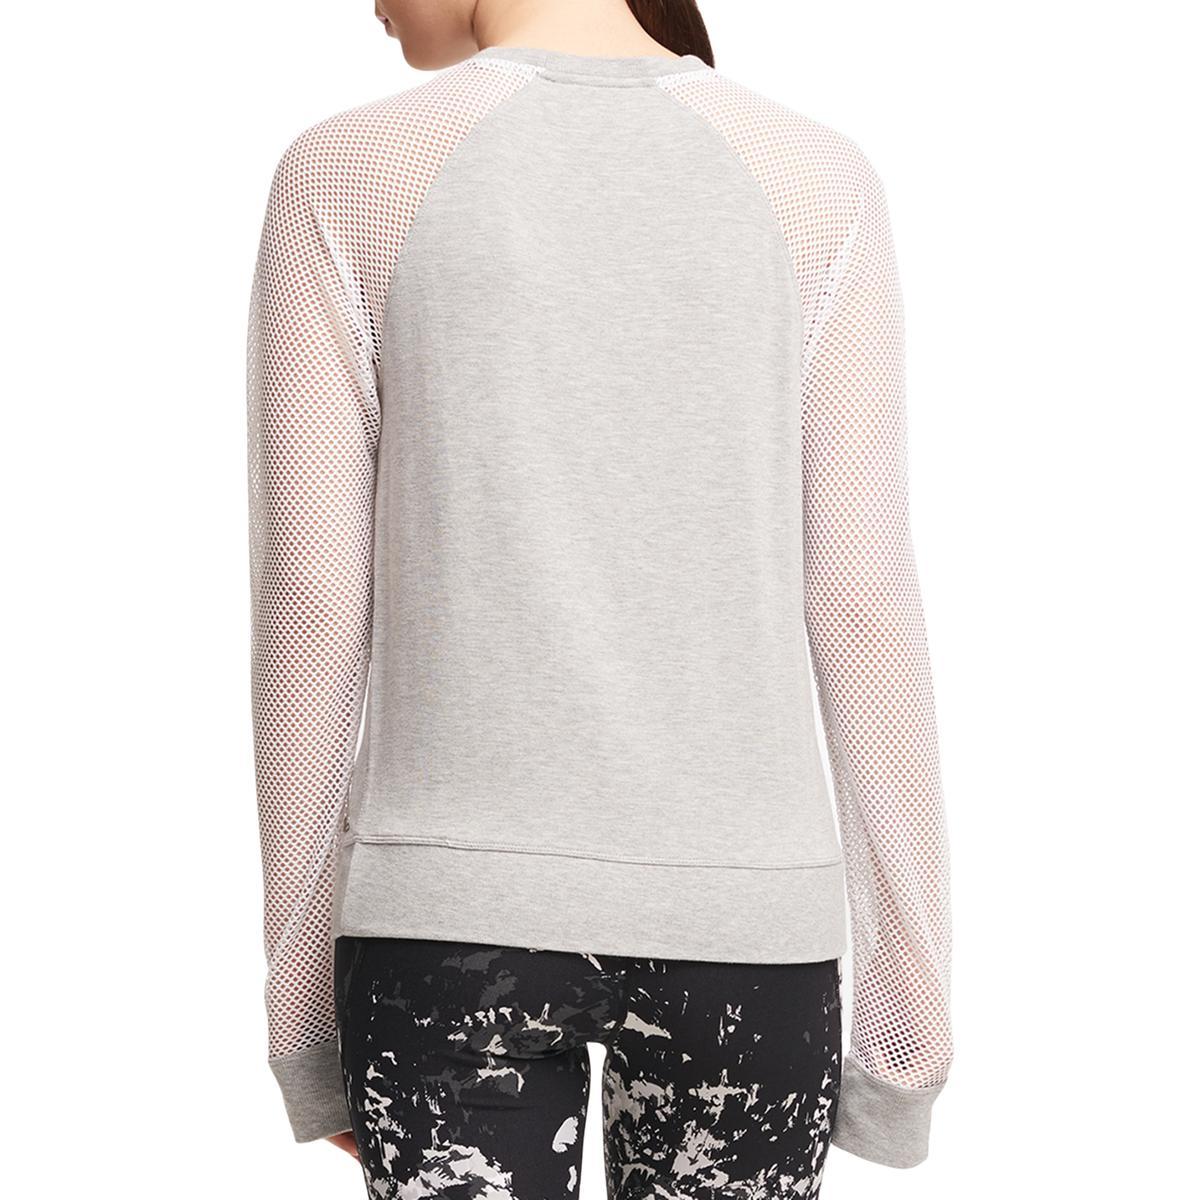 7b48306cf687f Details about DKNY Sport Womens Mesh Sleeve Fitness Sweatshirt